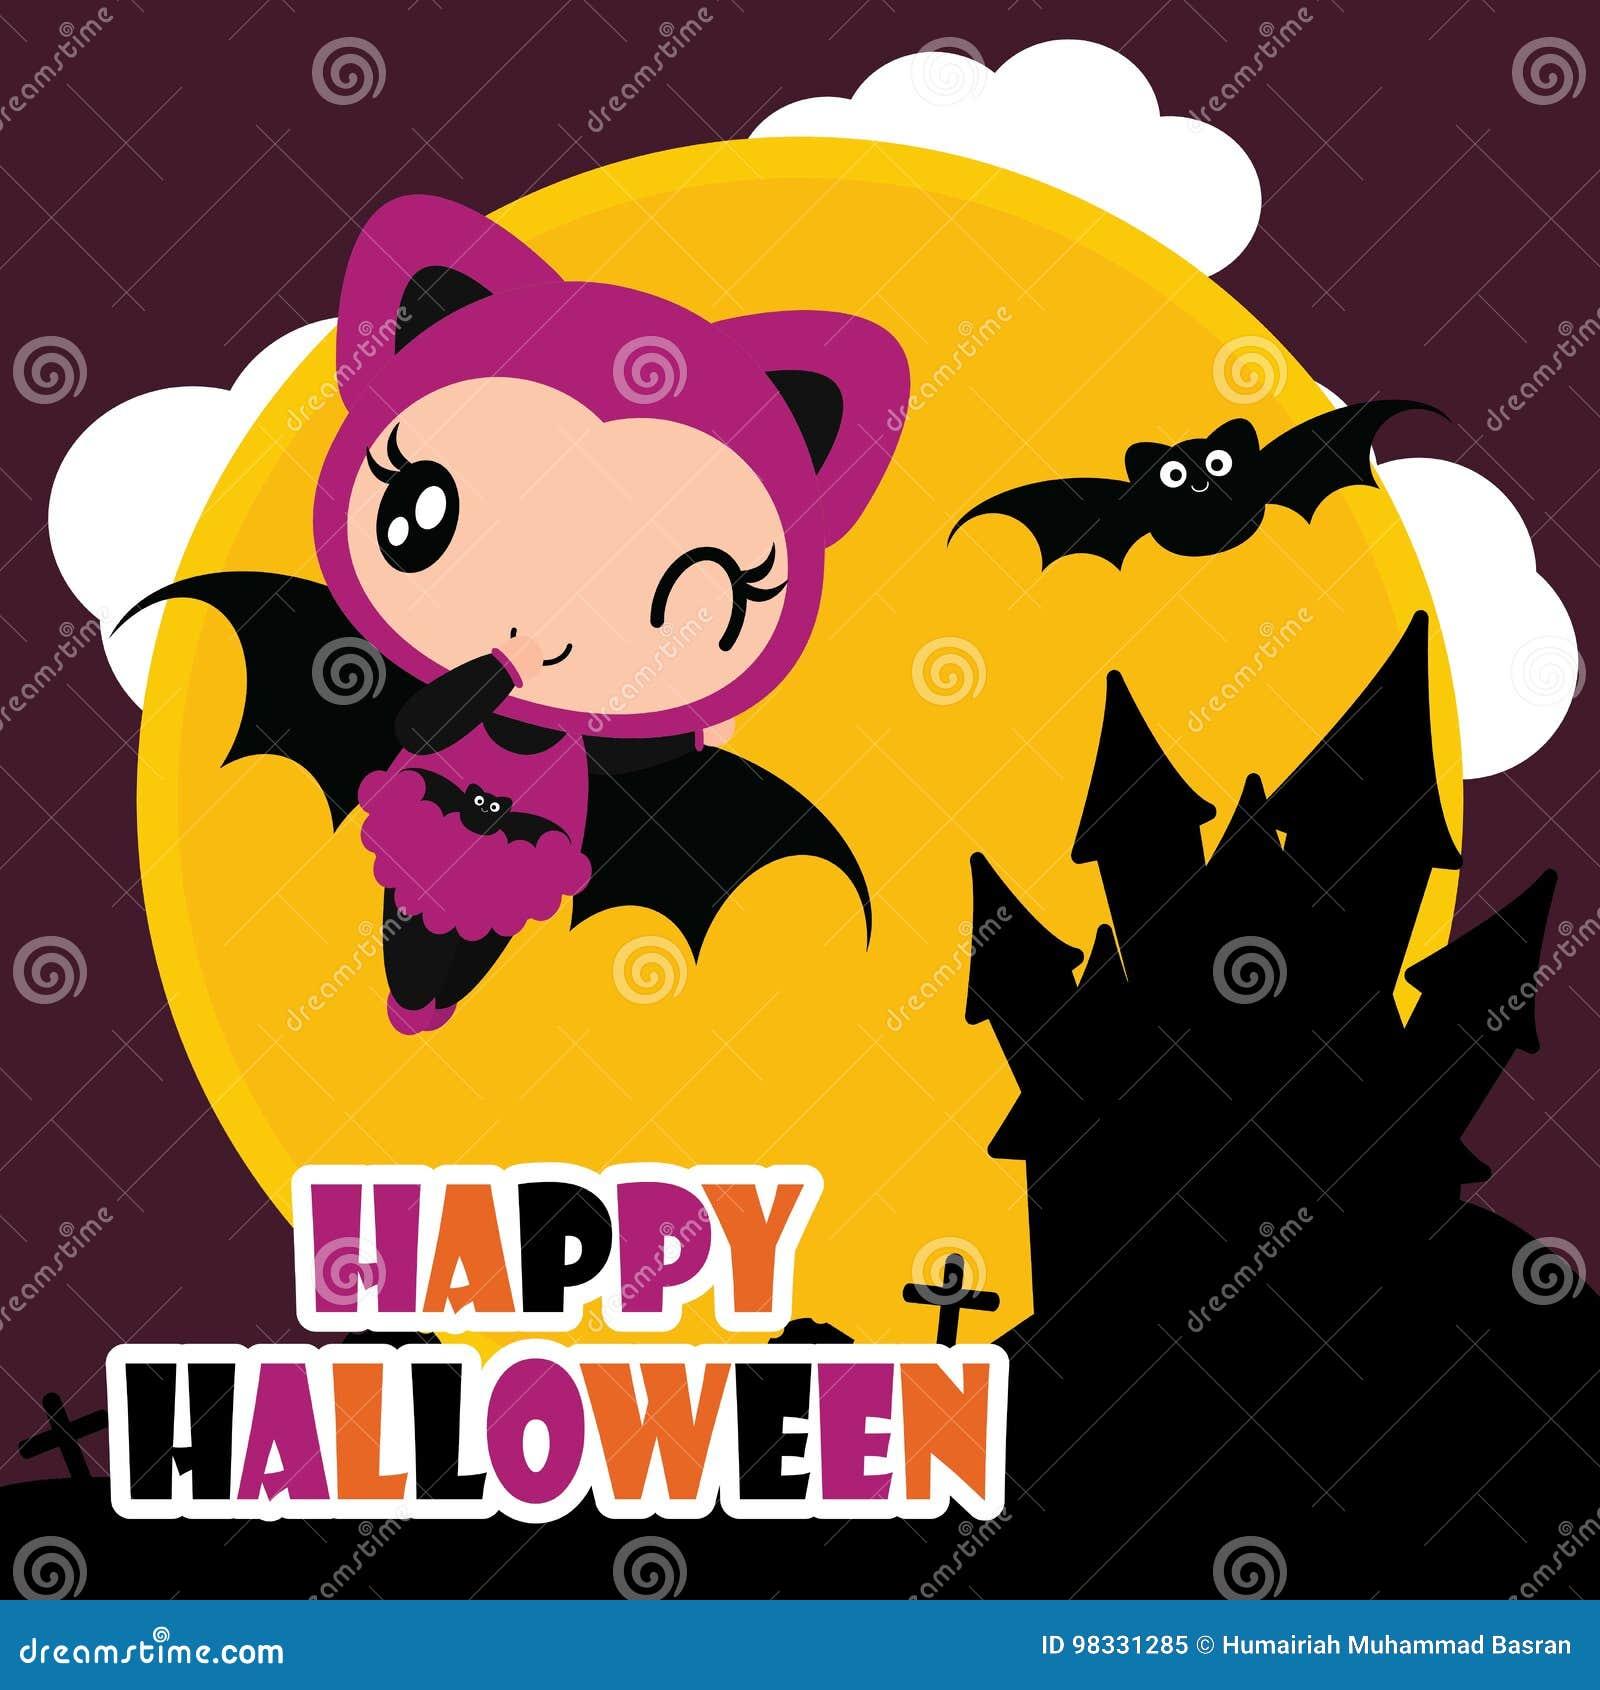 Cute Bat Girl Fly With Black Bat Cartoon Illustration For Halloween